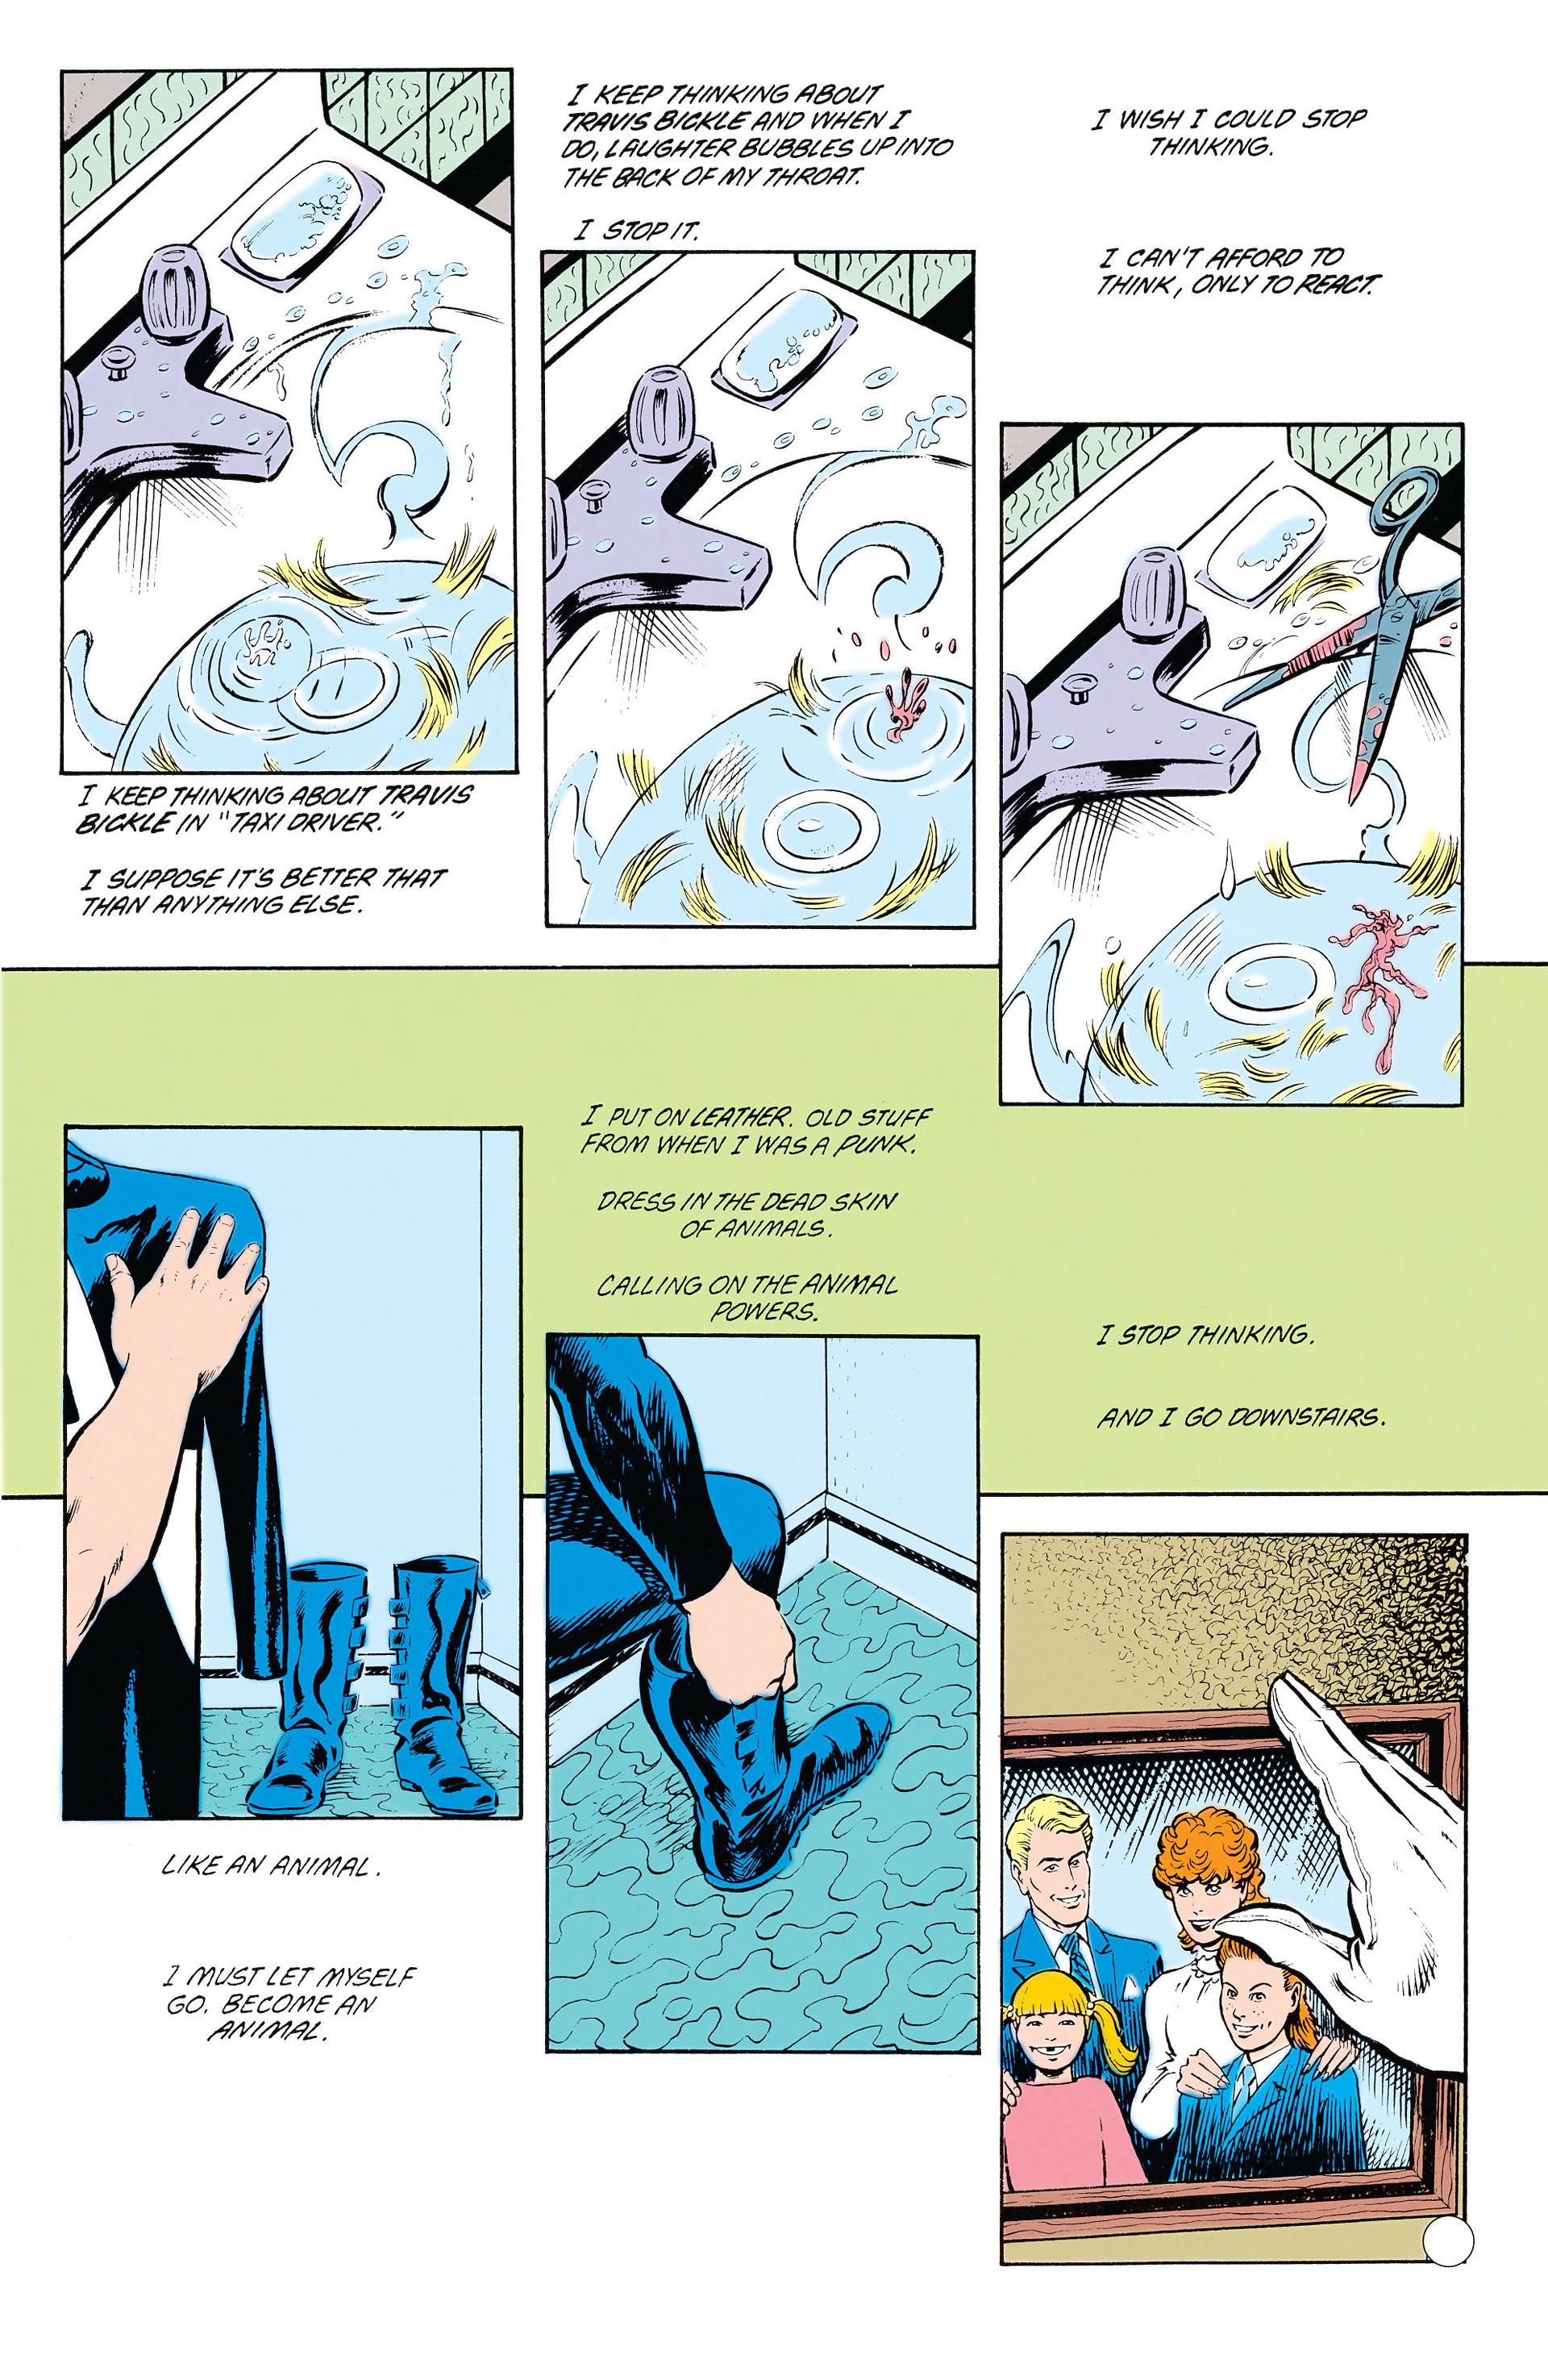 Animal Man (1988) 21 Page 1